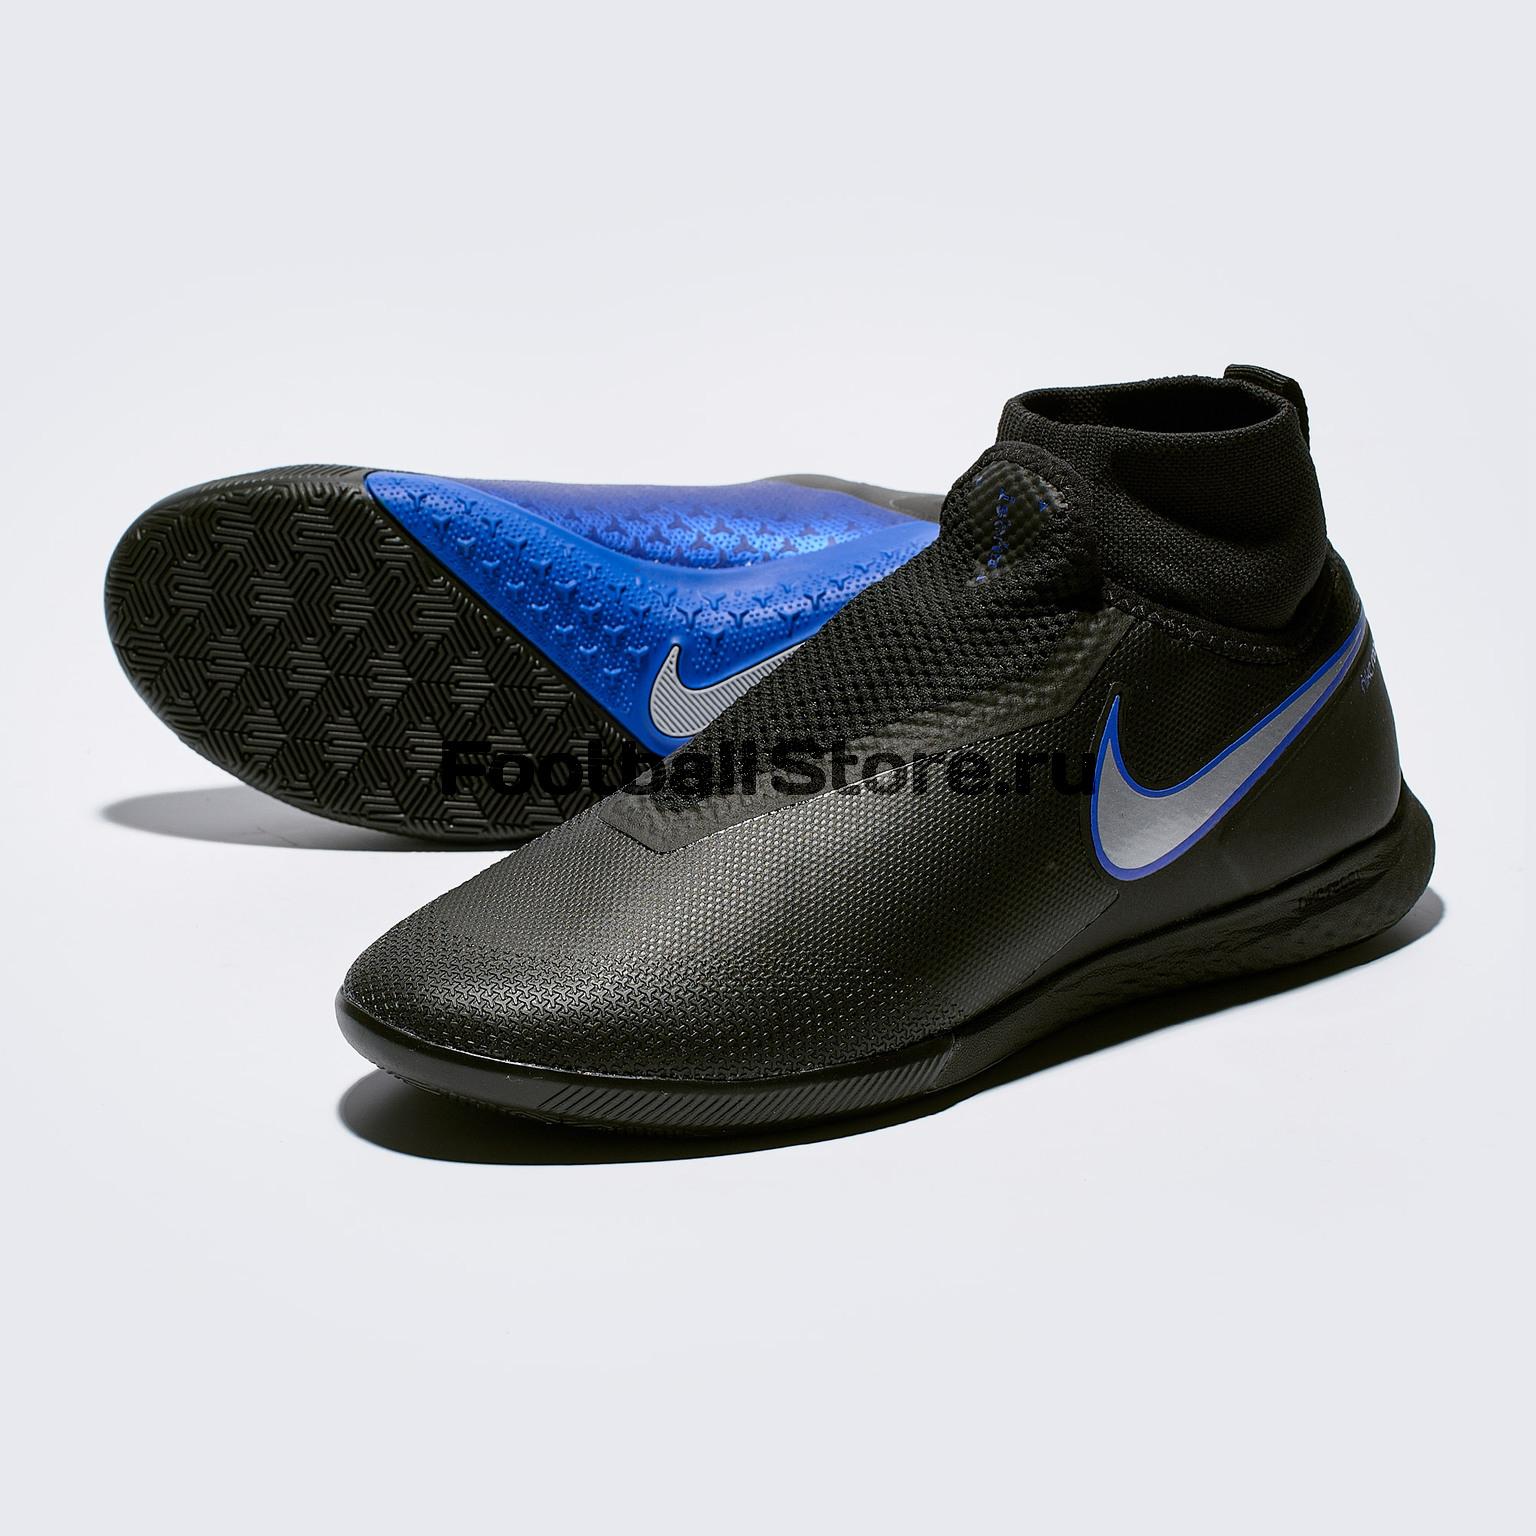 Футзалки Nike React Phantom Vision Pro DF IC AO3276-004 бутсы детские nike phantom vision academy df sg aq9298 400